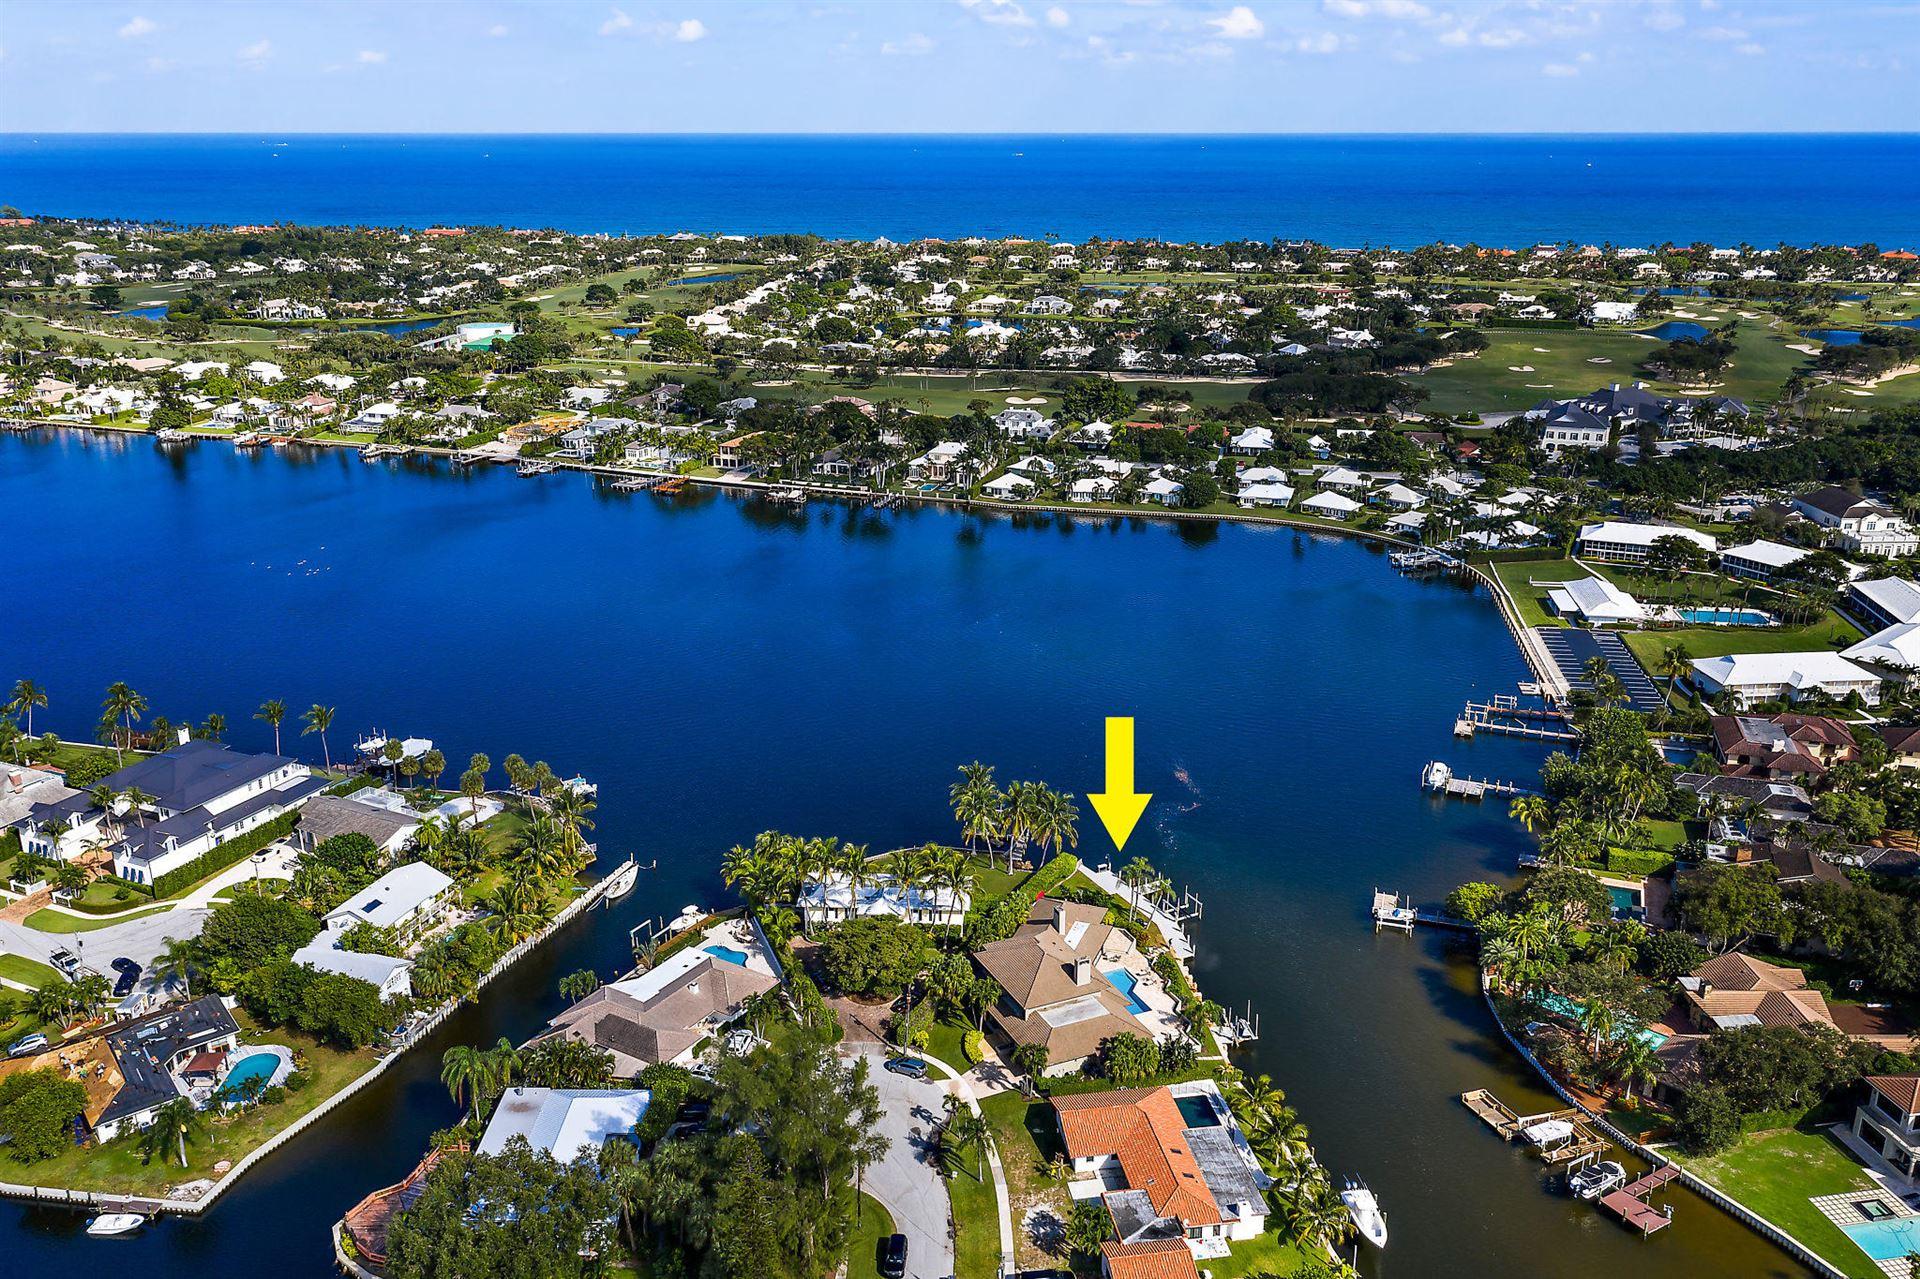 Photo for 1454 Point Way, North Palm Beach, FL 33408 (MLS # RX-10718343)